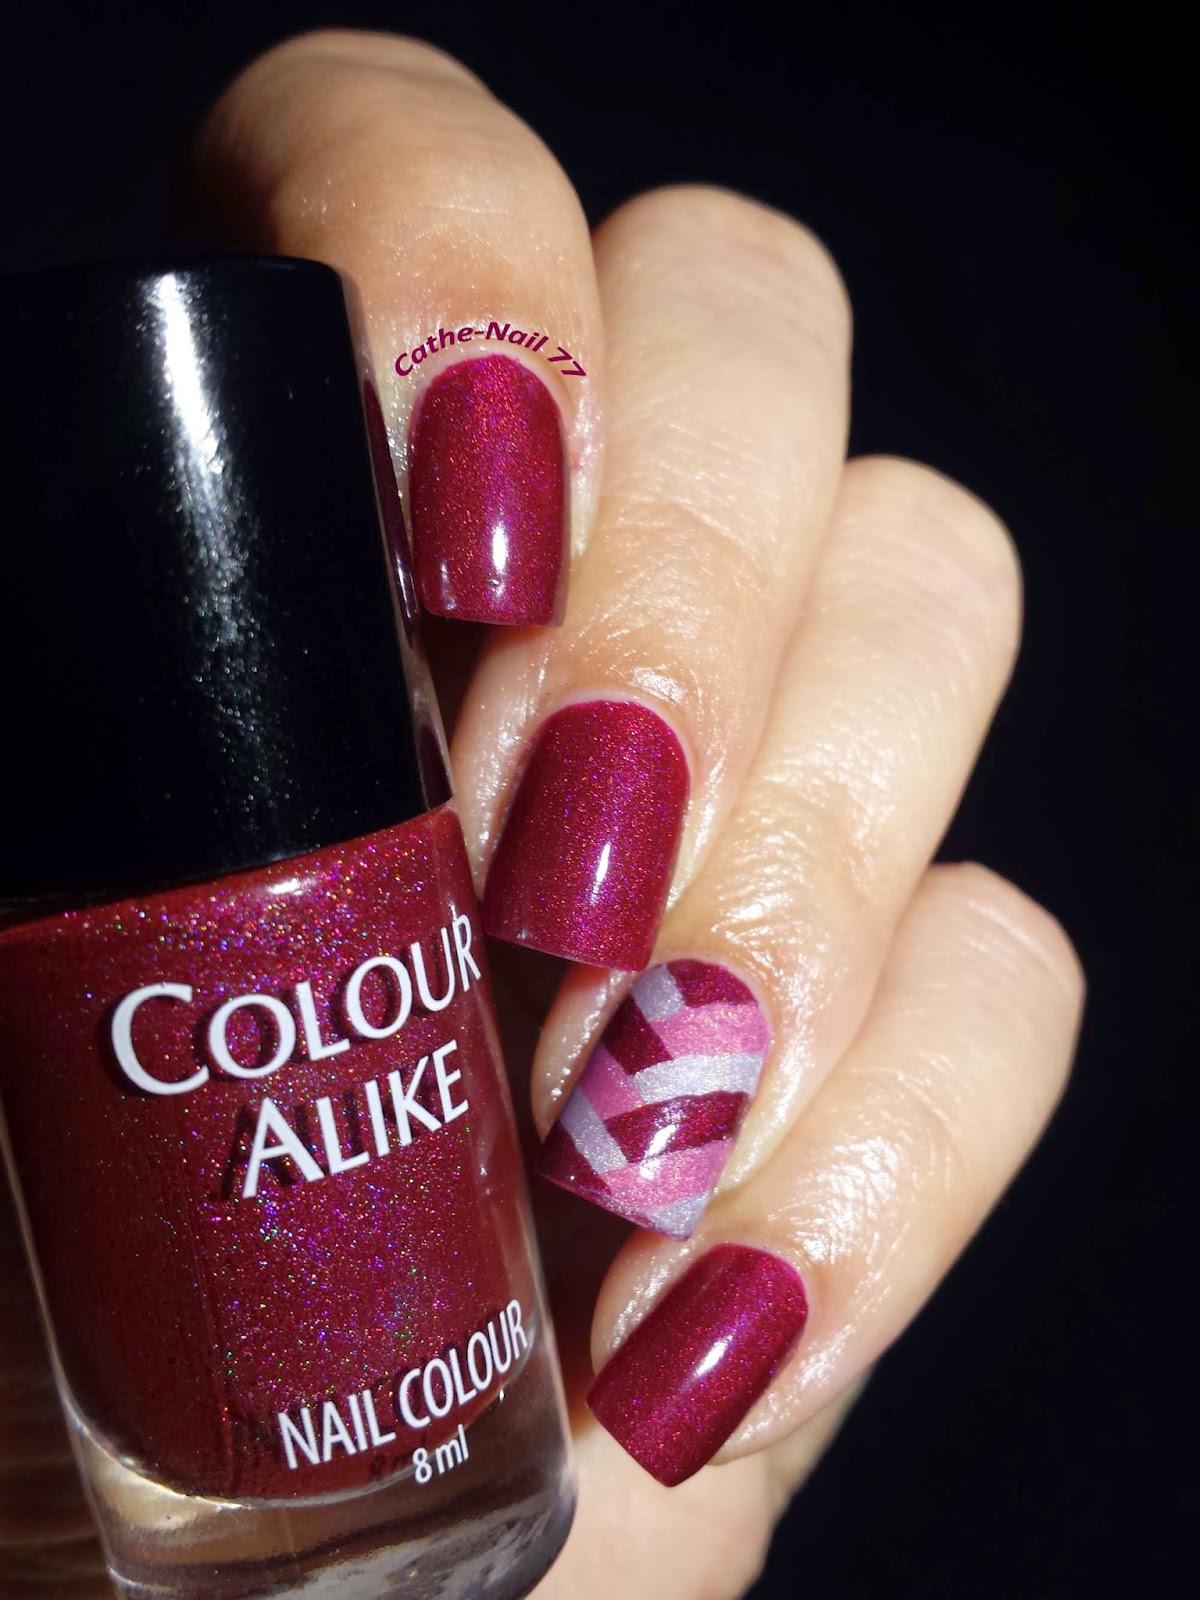 http://cathenail.blogspot.fr/2014/09/colour-alike-503-et-braided-accent-nail.html